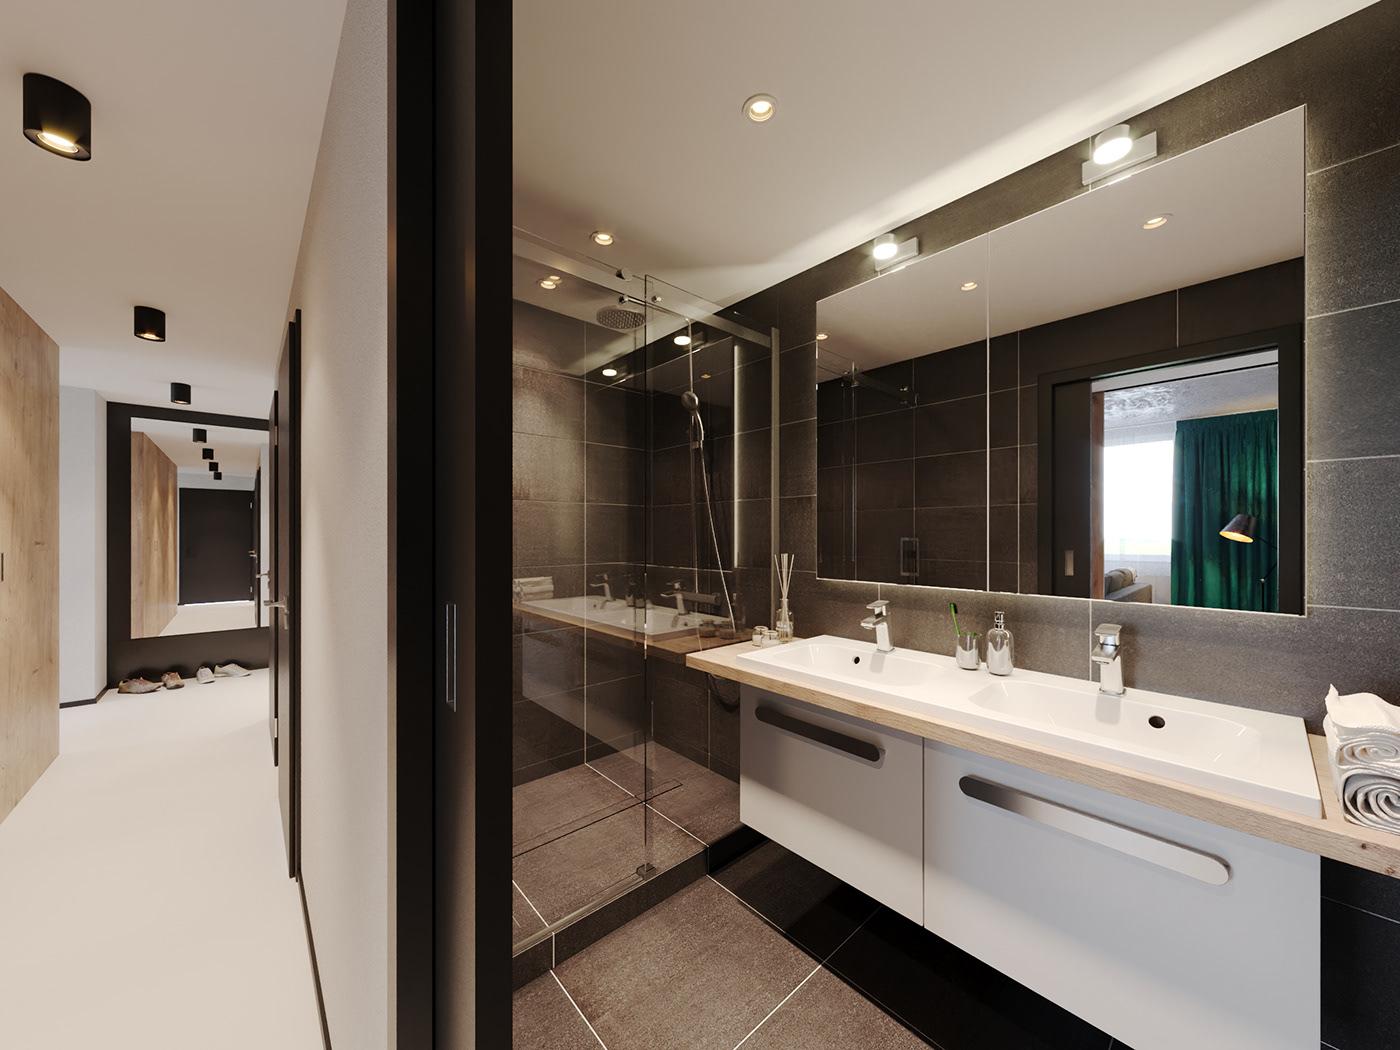 Image may contain: floor, indoor and bathroom